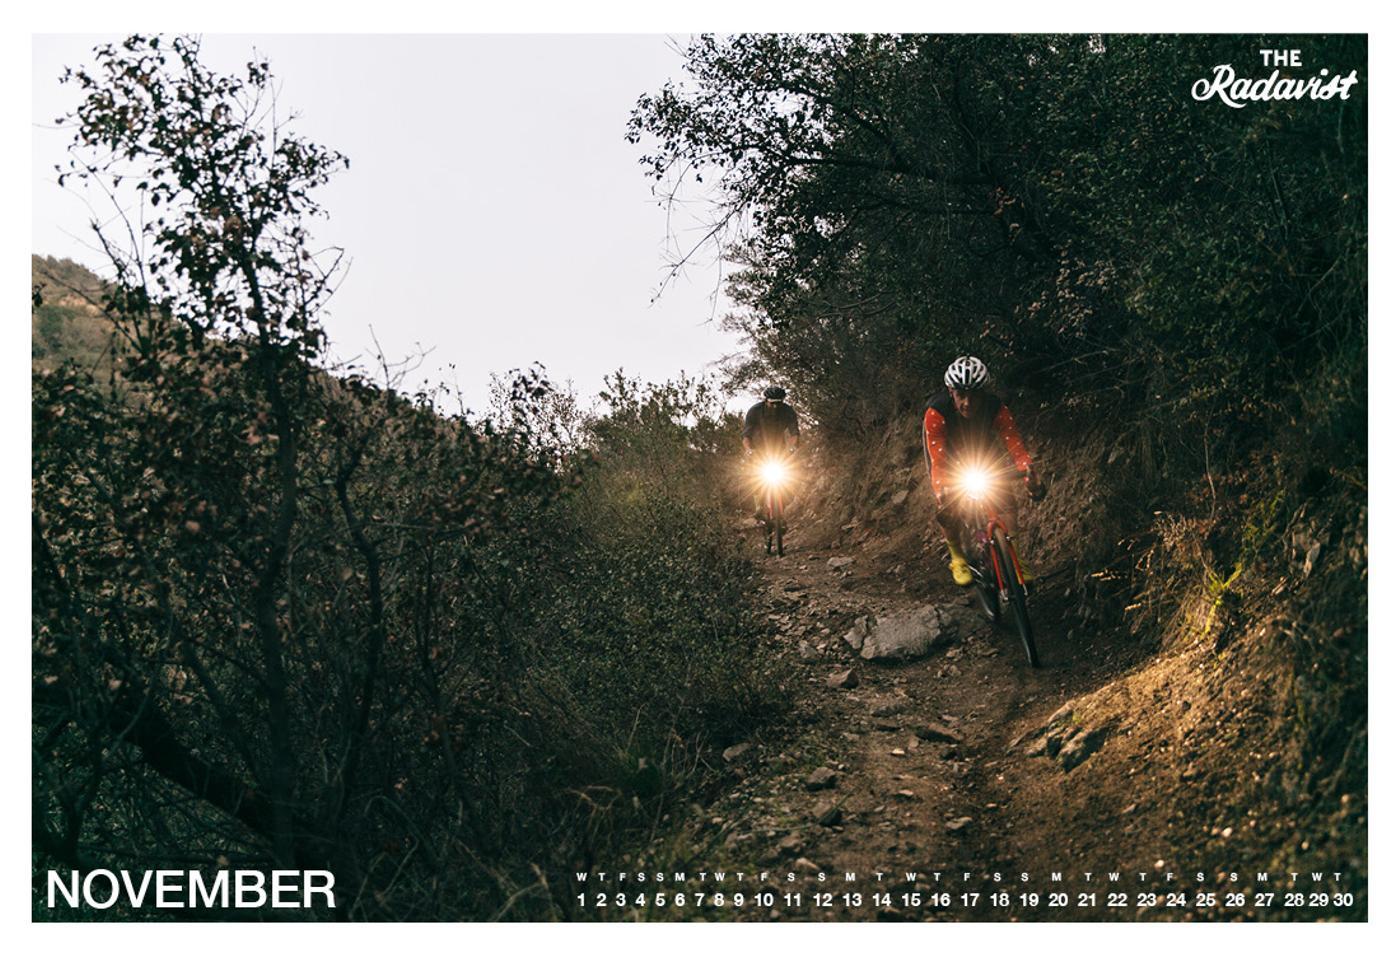 The Radavist 2017 Calendar: November